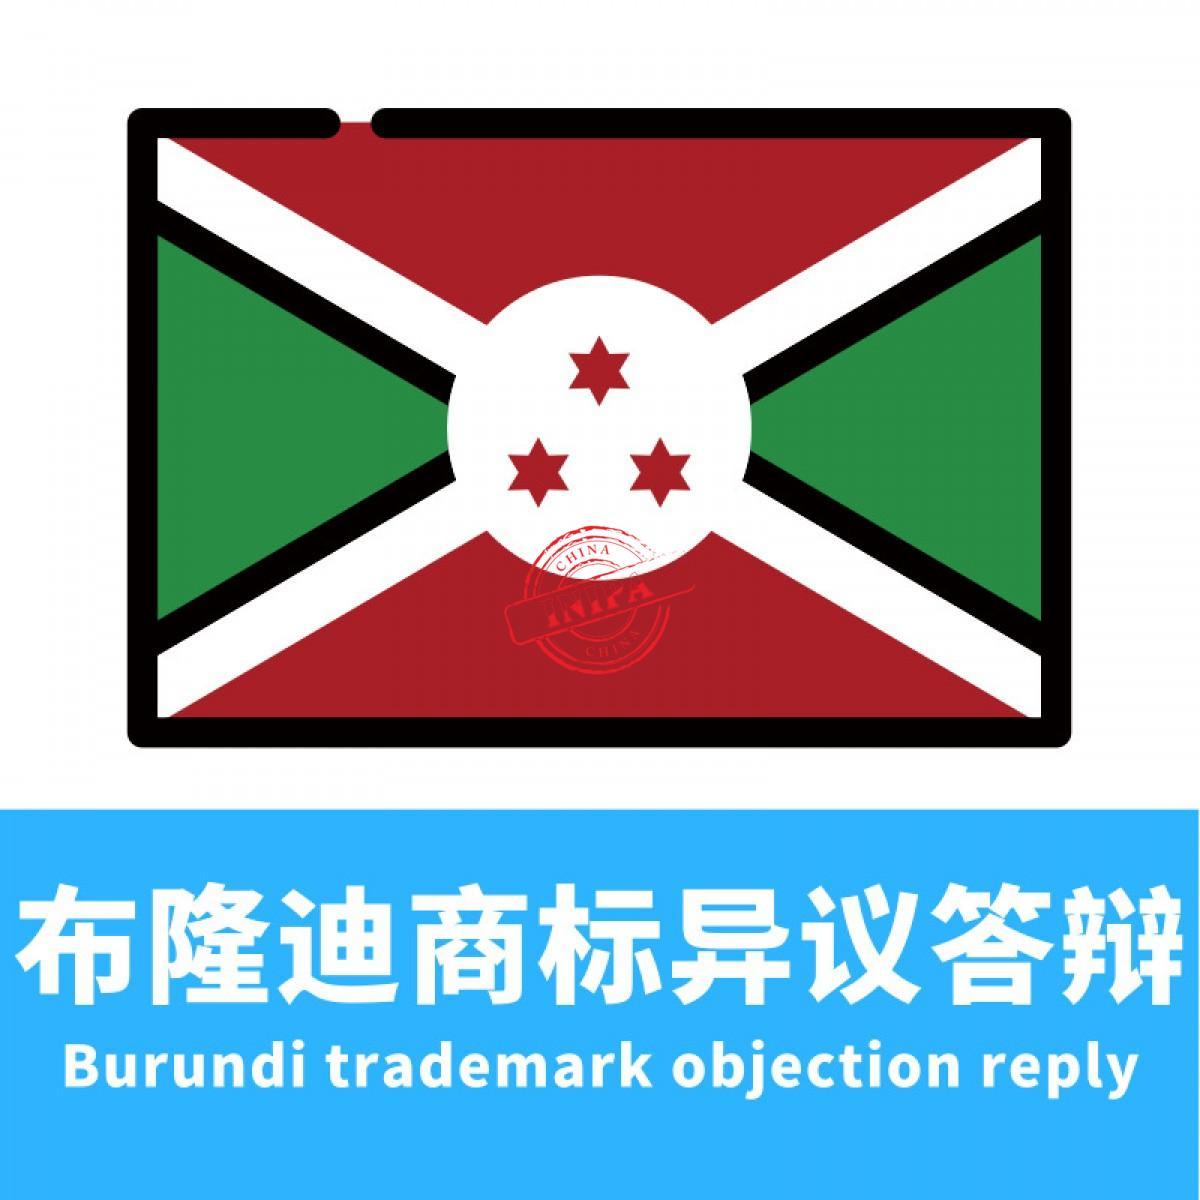 布隆迪商标异议答辩/Burundi trademark objection reply